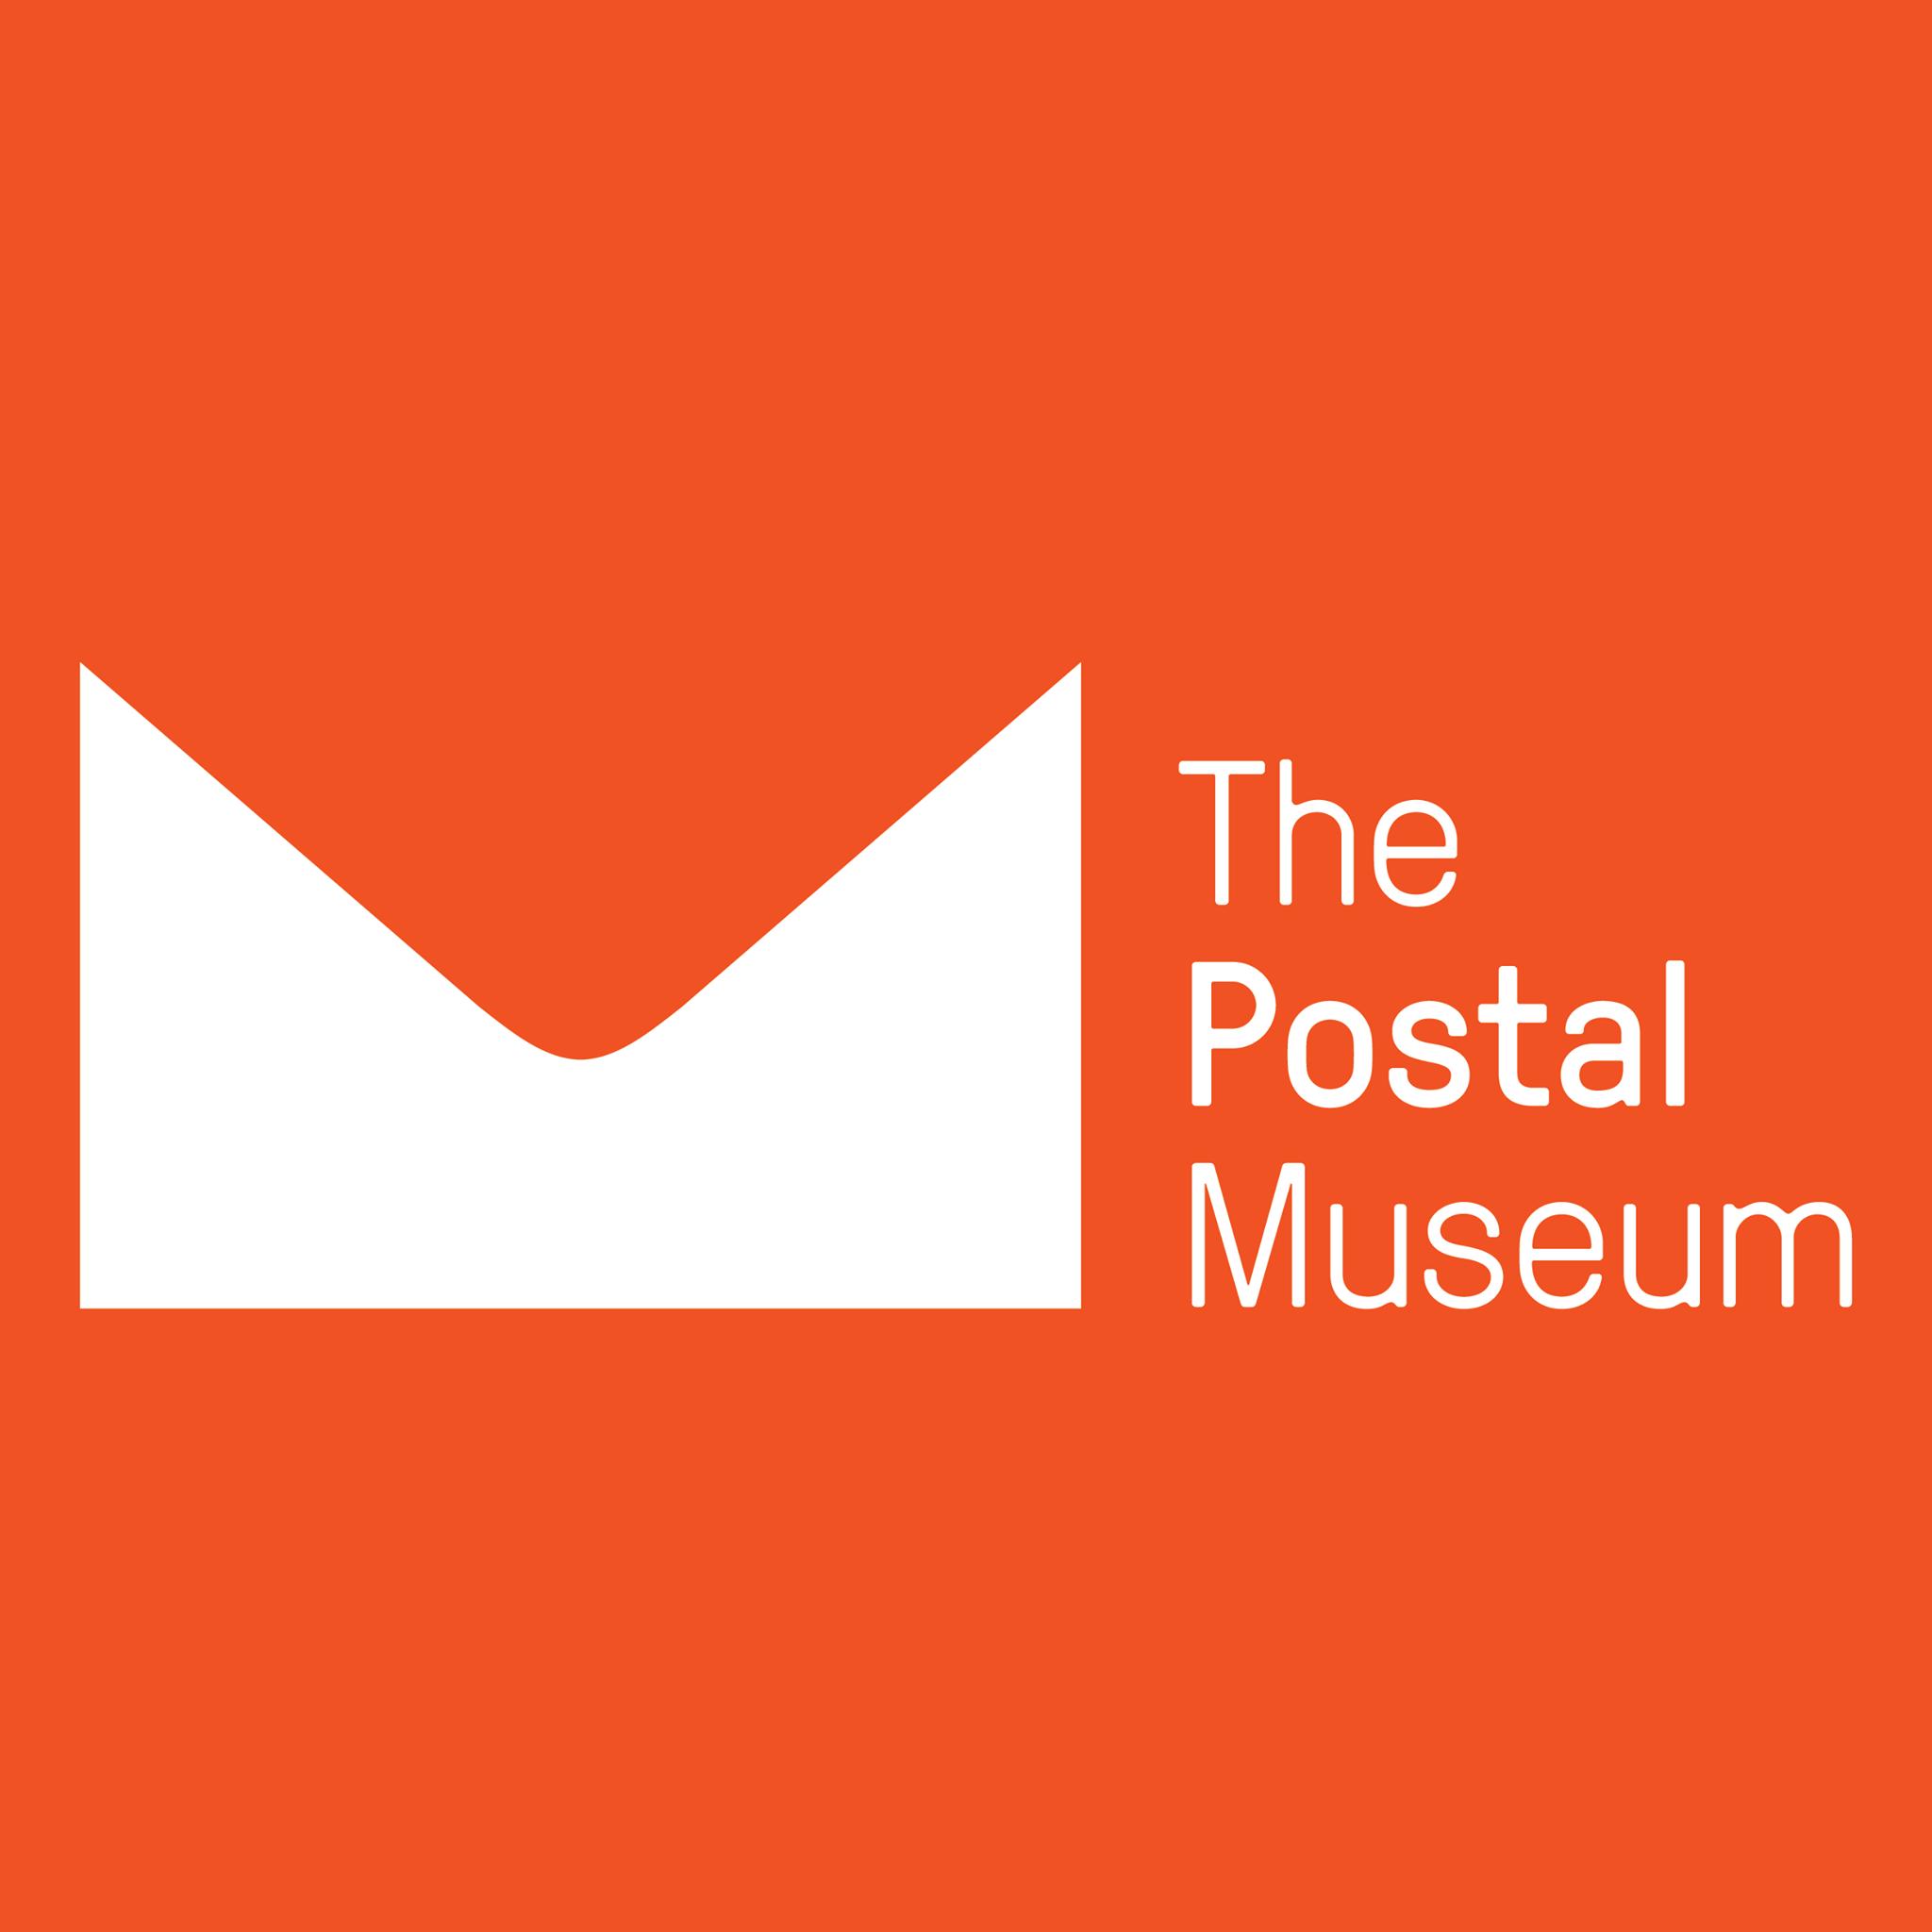 The Postal Museum logo